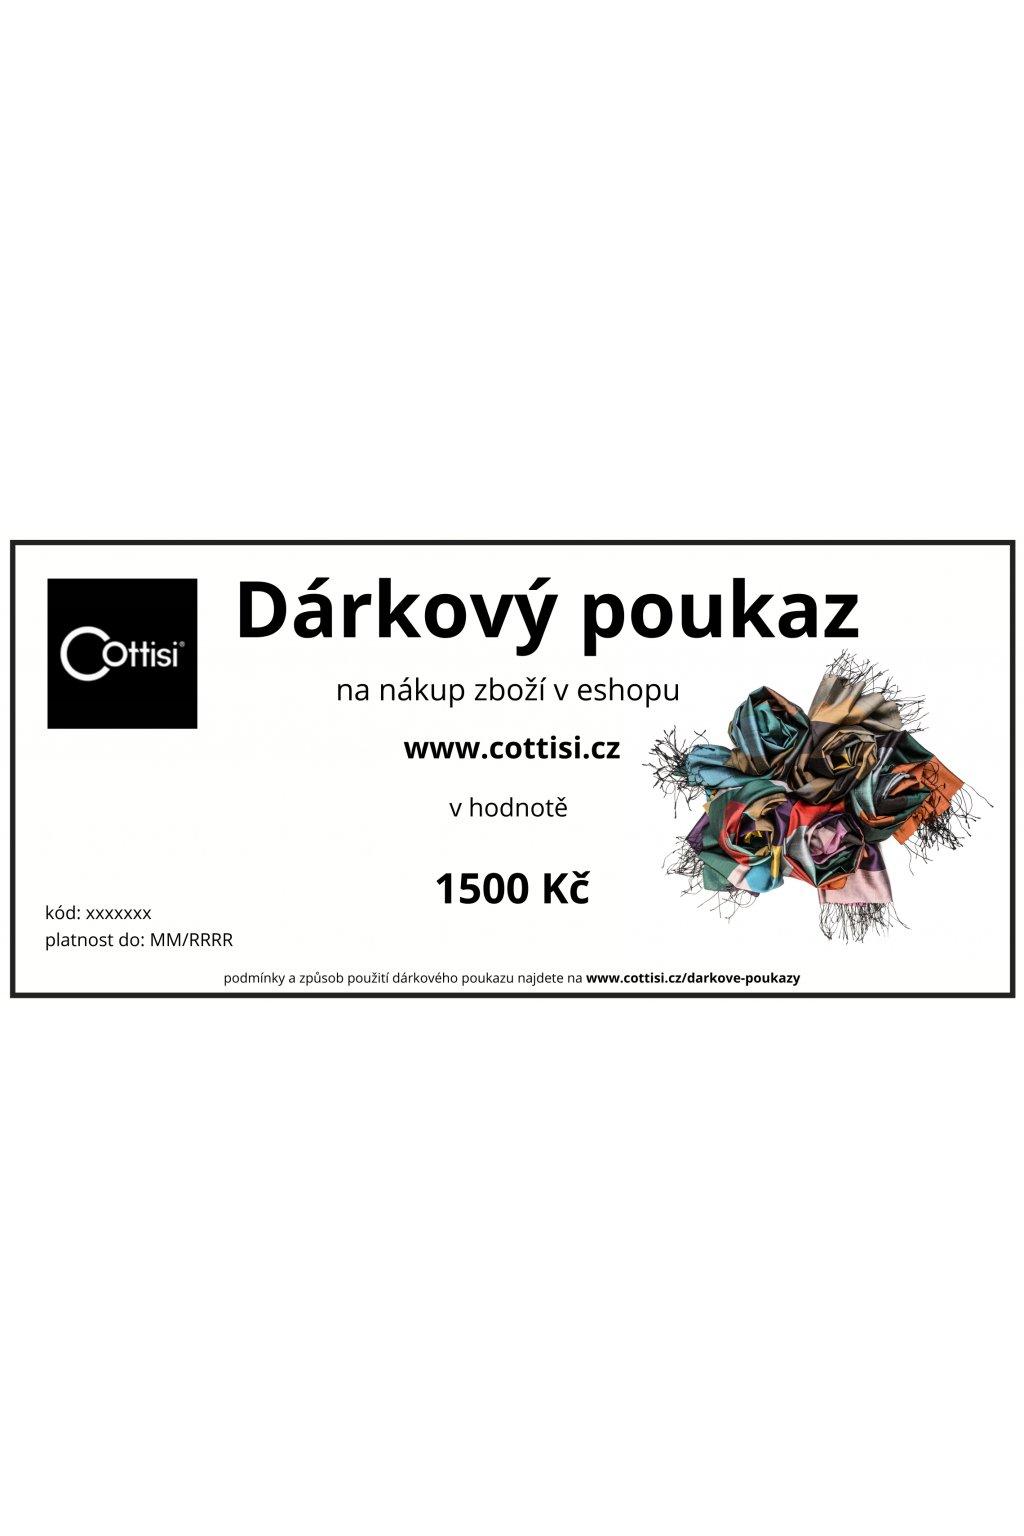 DV 1500